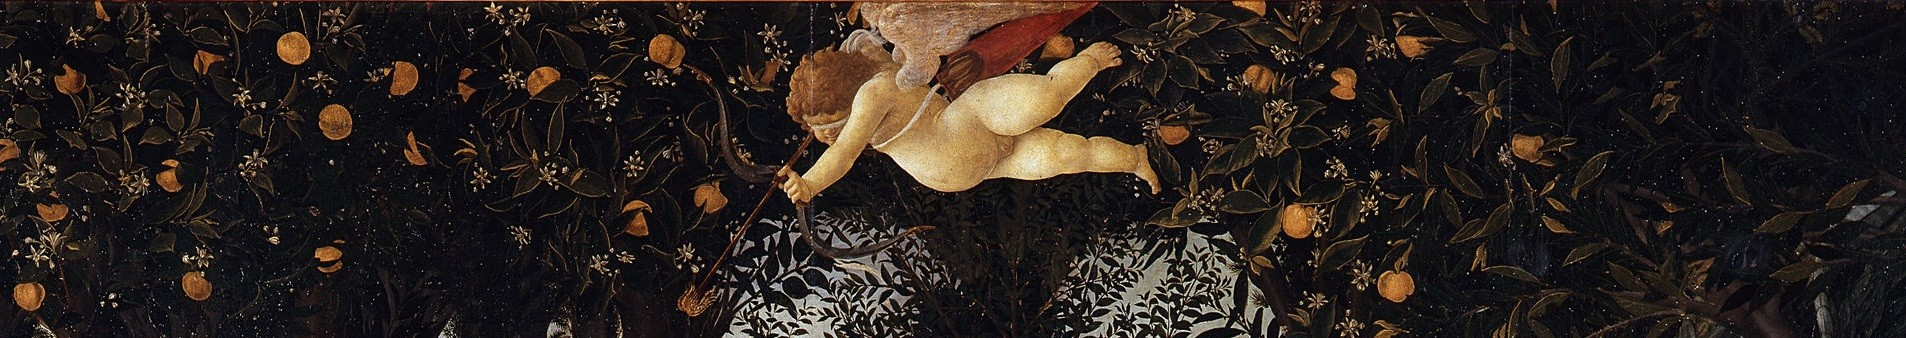 botticelli-ilkbahar-eros